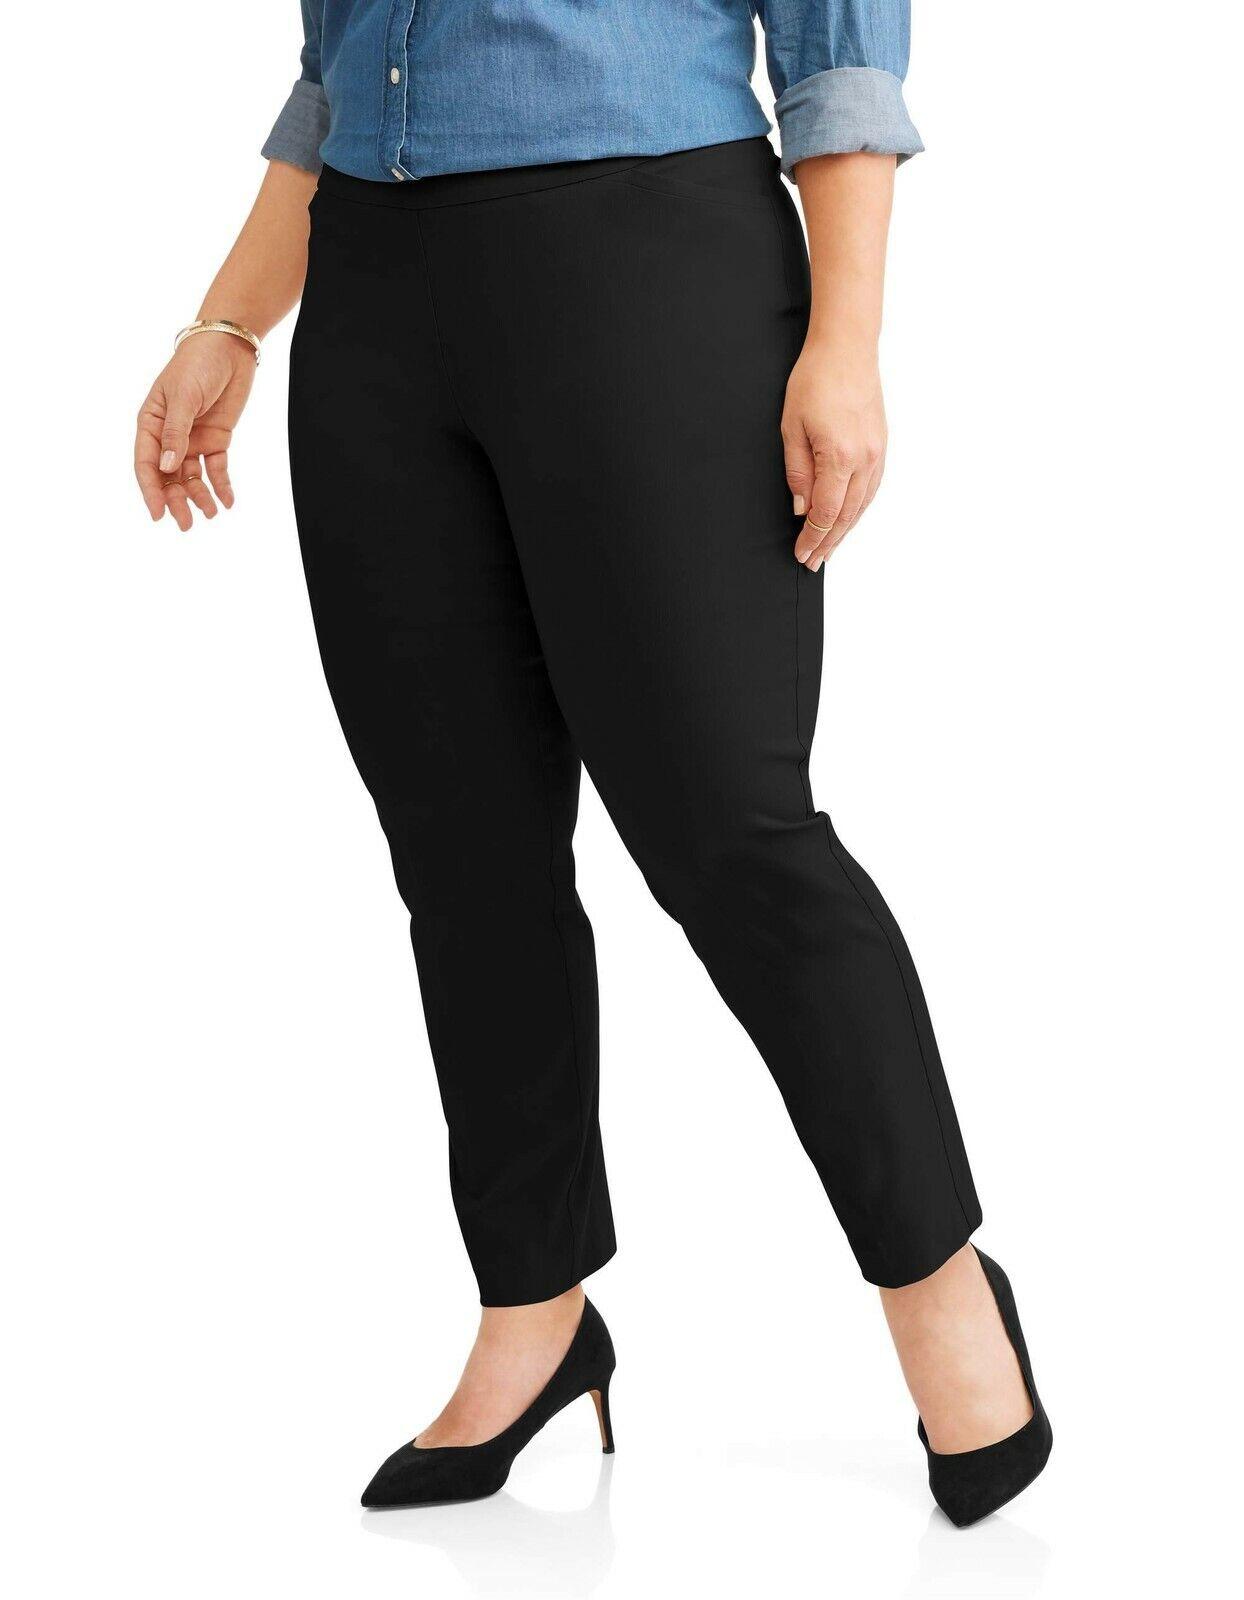 NWT Womens St John/'s Bay Straight Leg Velour Pants Size 2X